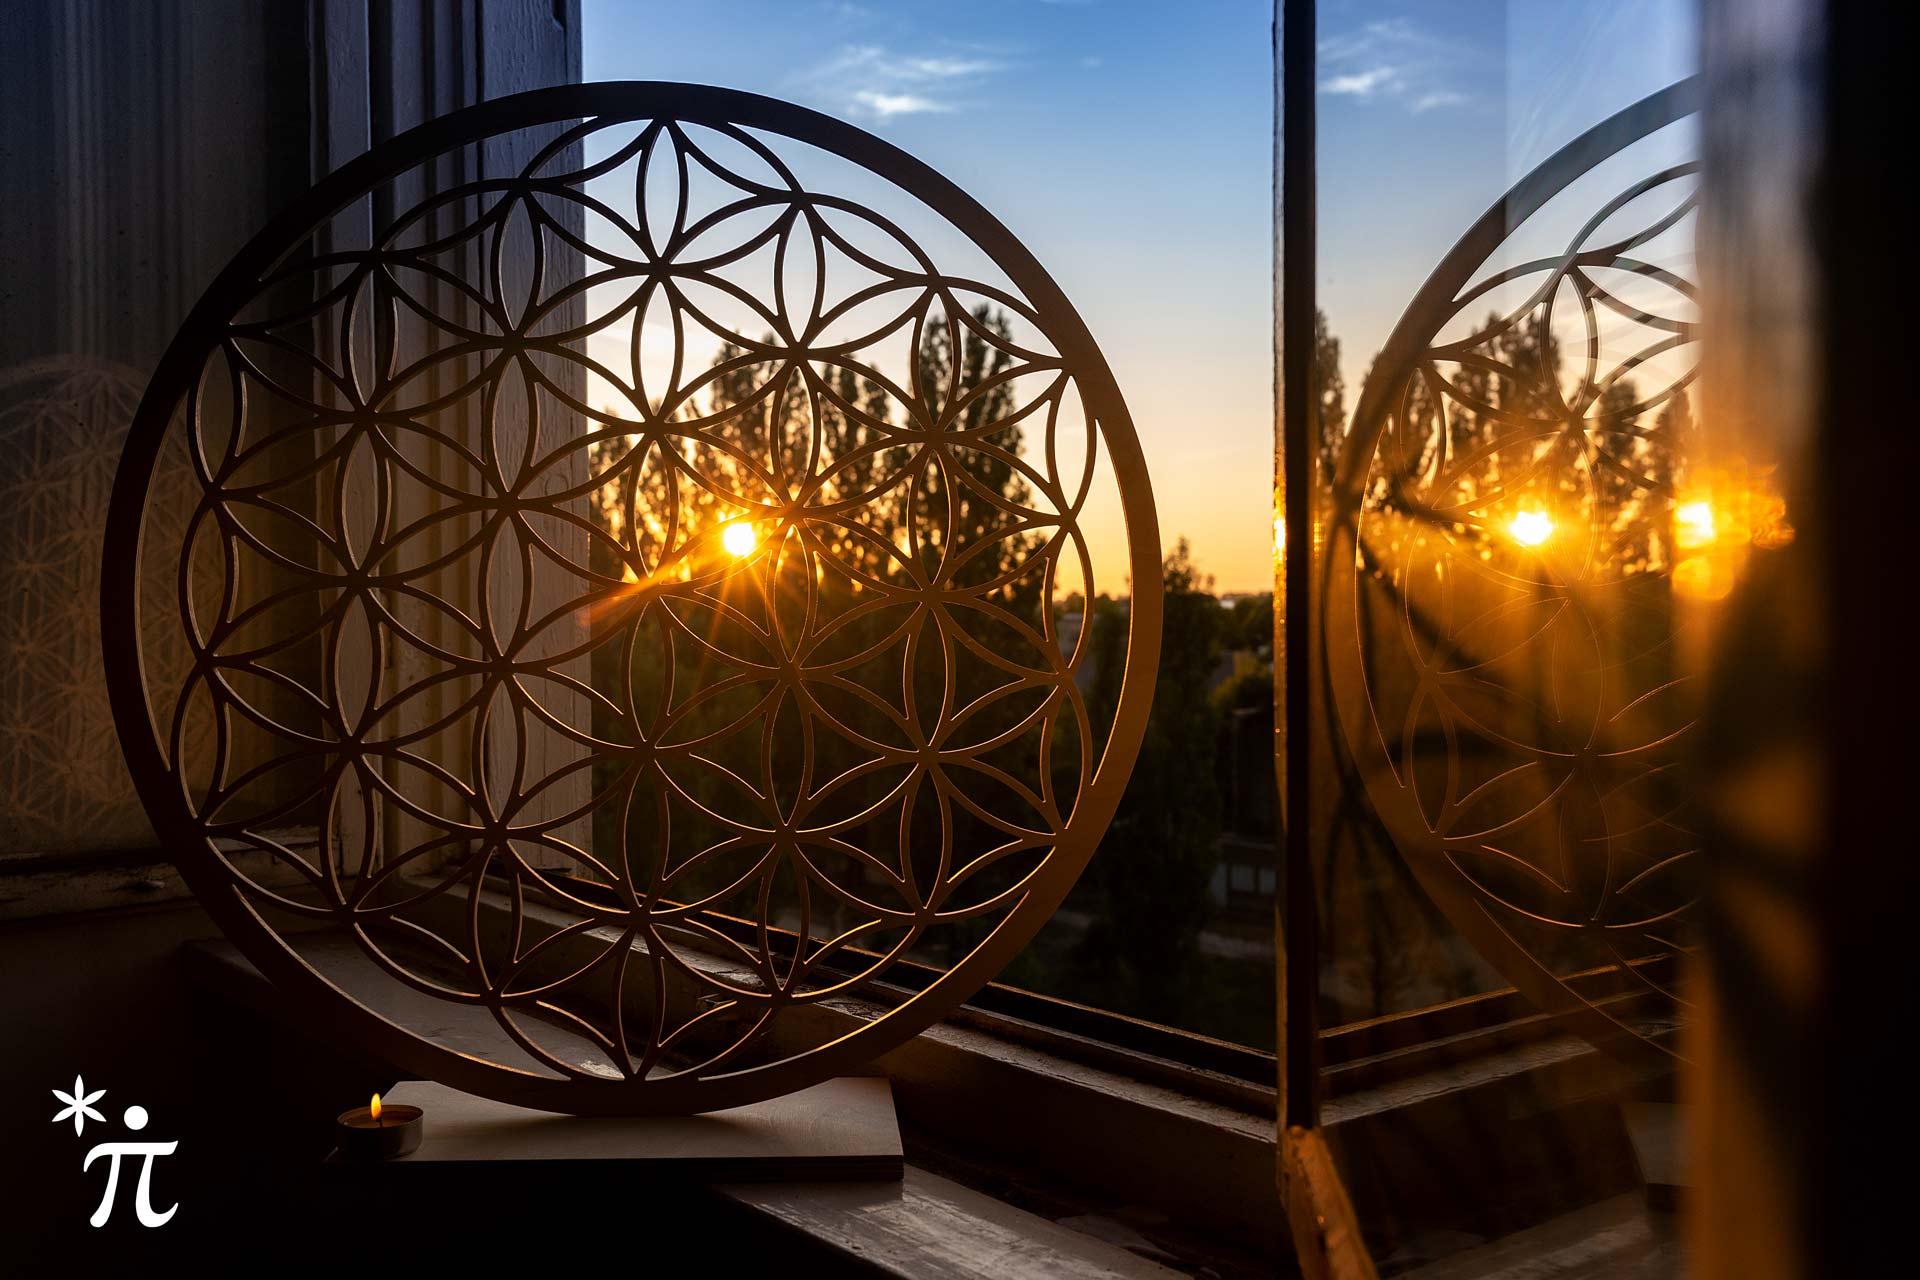 Blume-des-Lebens-aus-Holz-mit-Fuss-am-Fenster-bei-Sonnenuntergang